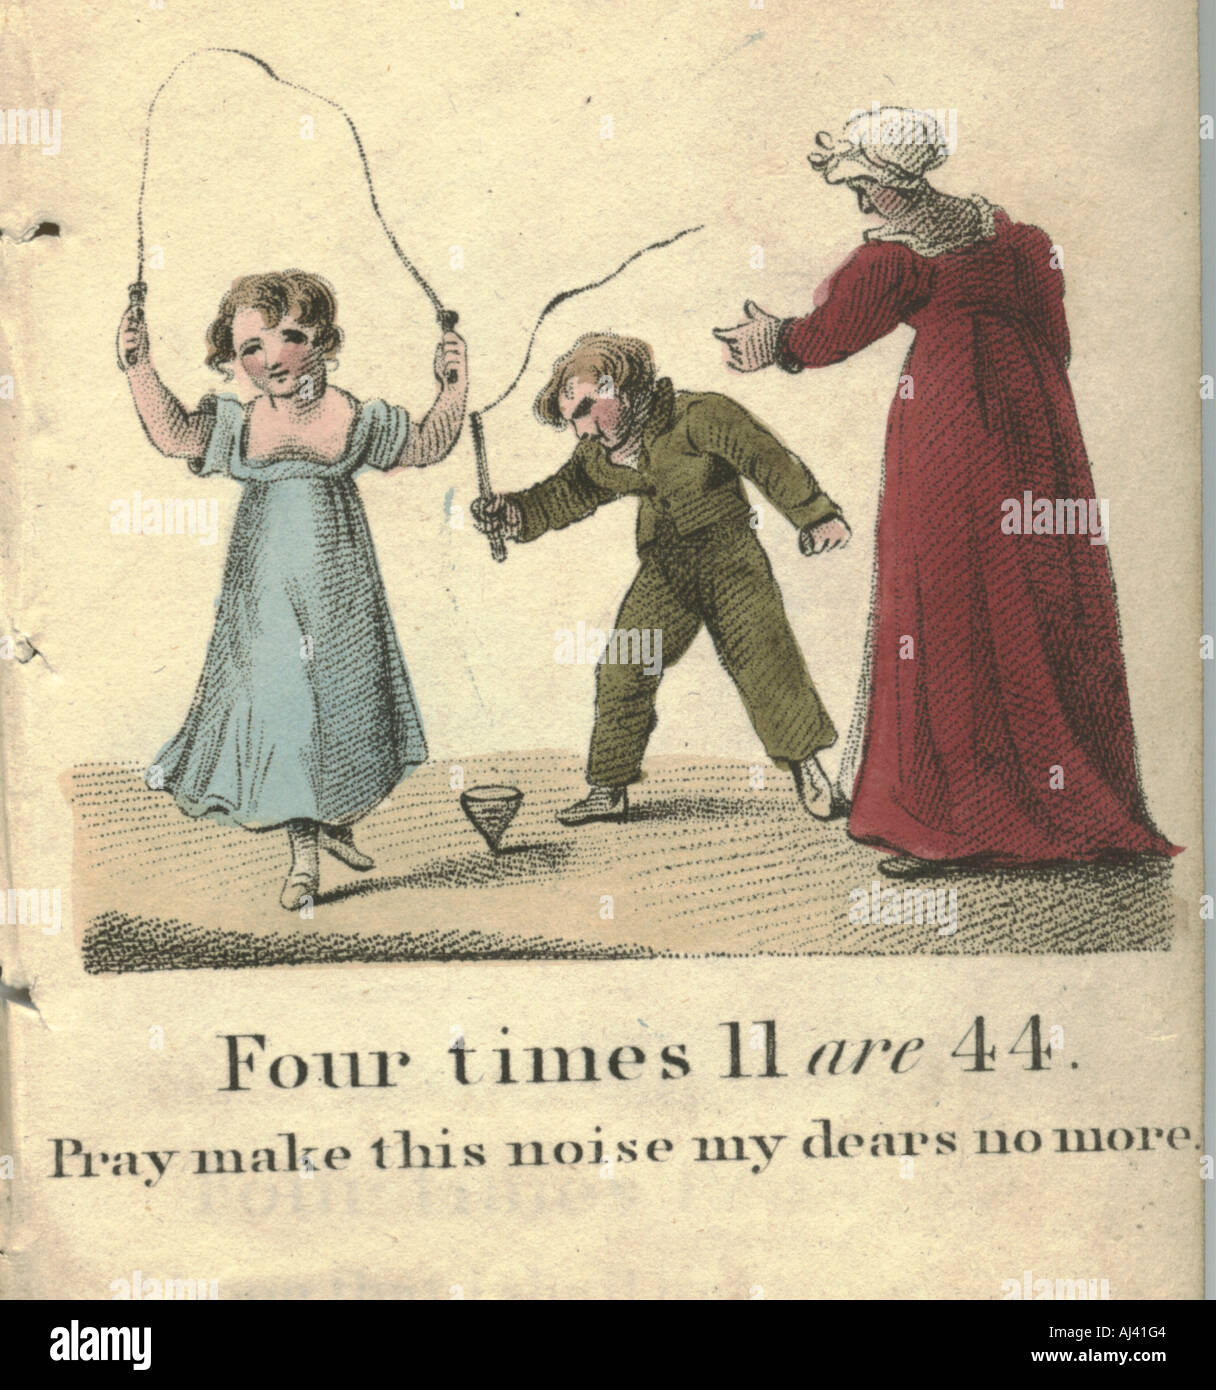 Marmaduke Multiply's merry method of making minor mathmaticians 1816 Stock Photo